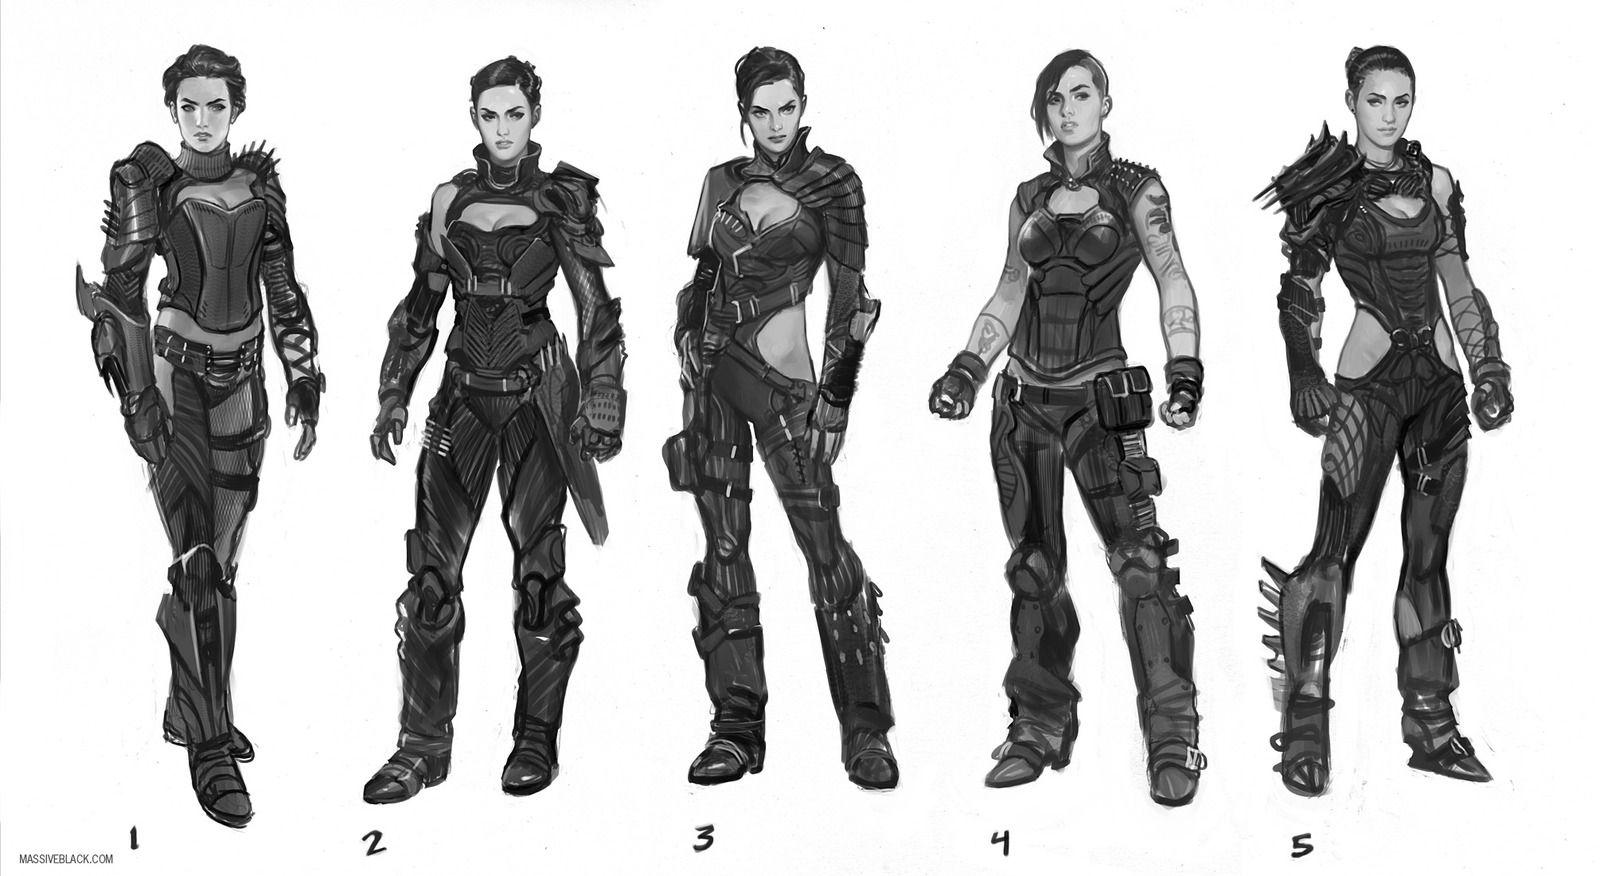 Ballistic Character Design Pdf : Female ballistic vest sci fi google search character